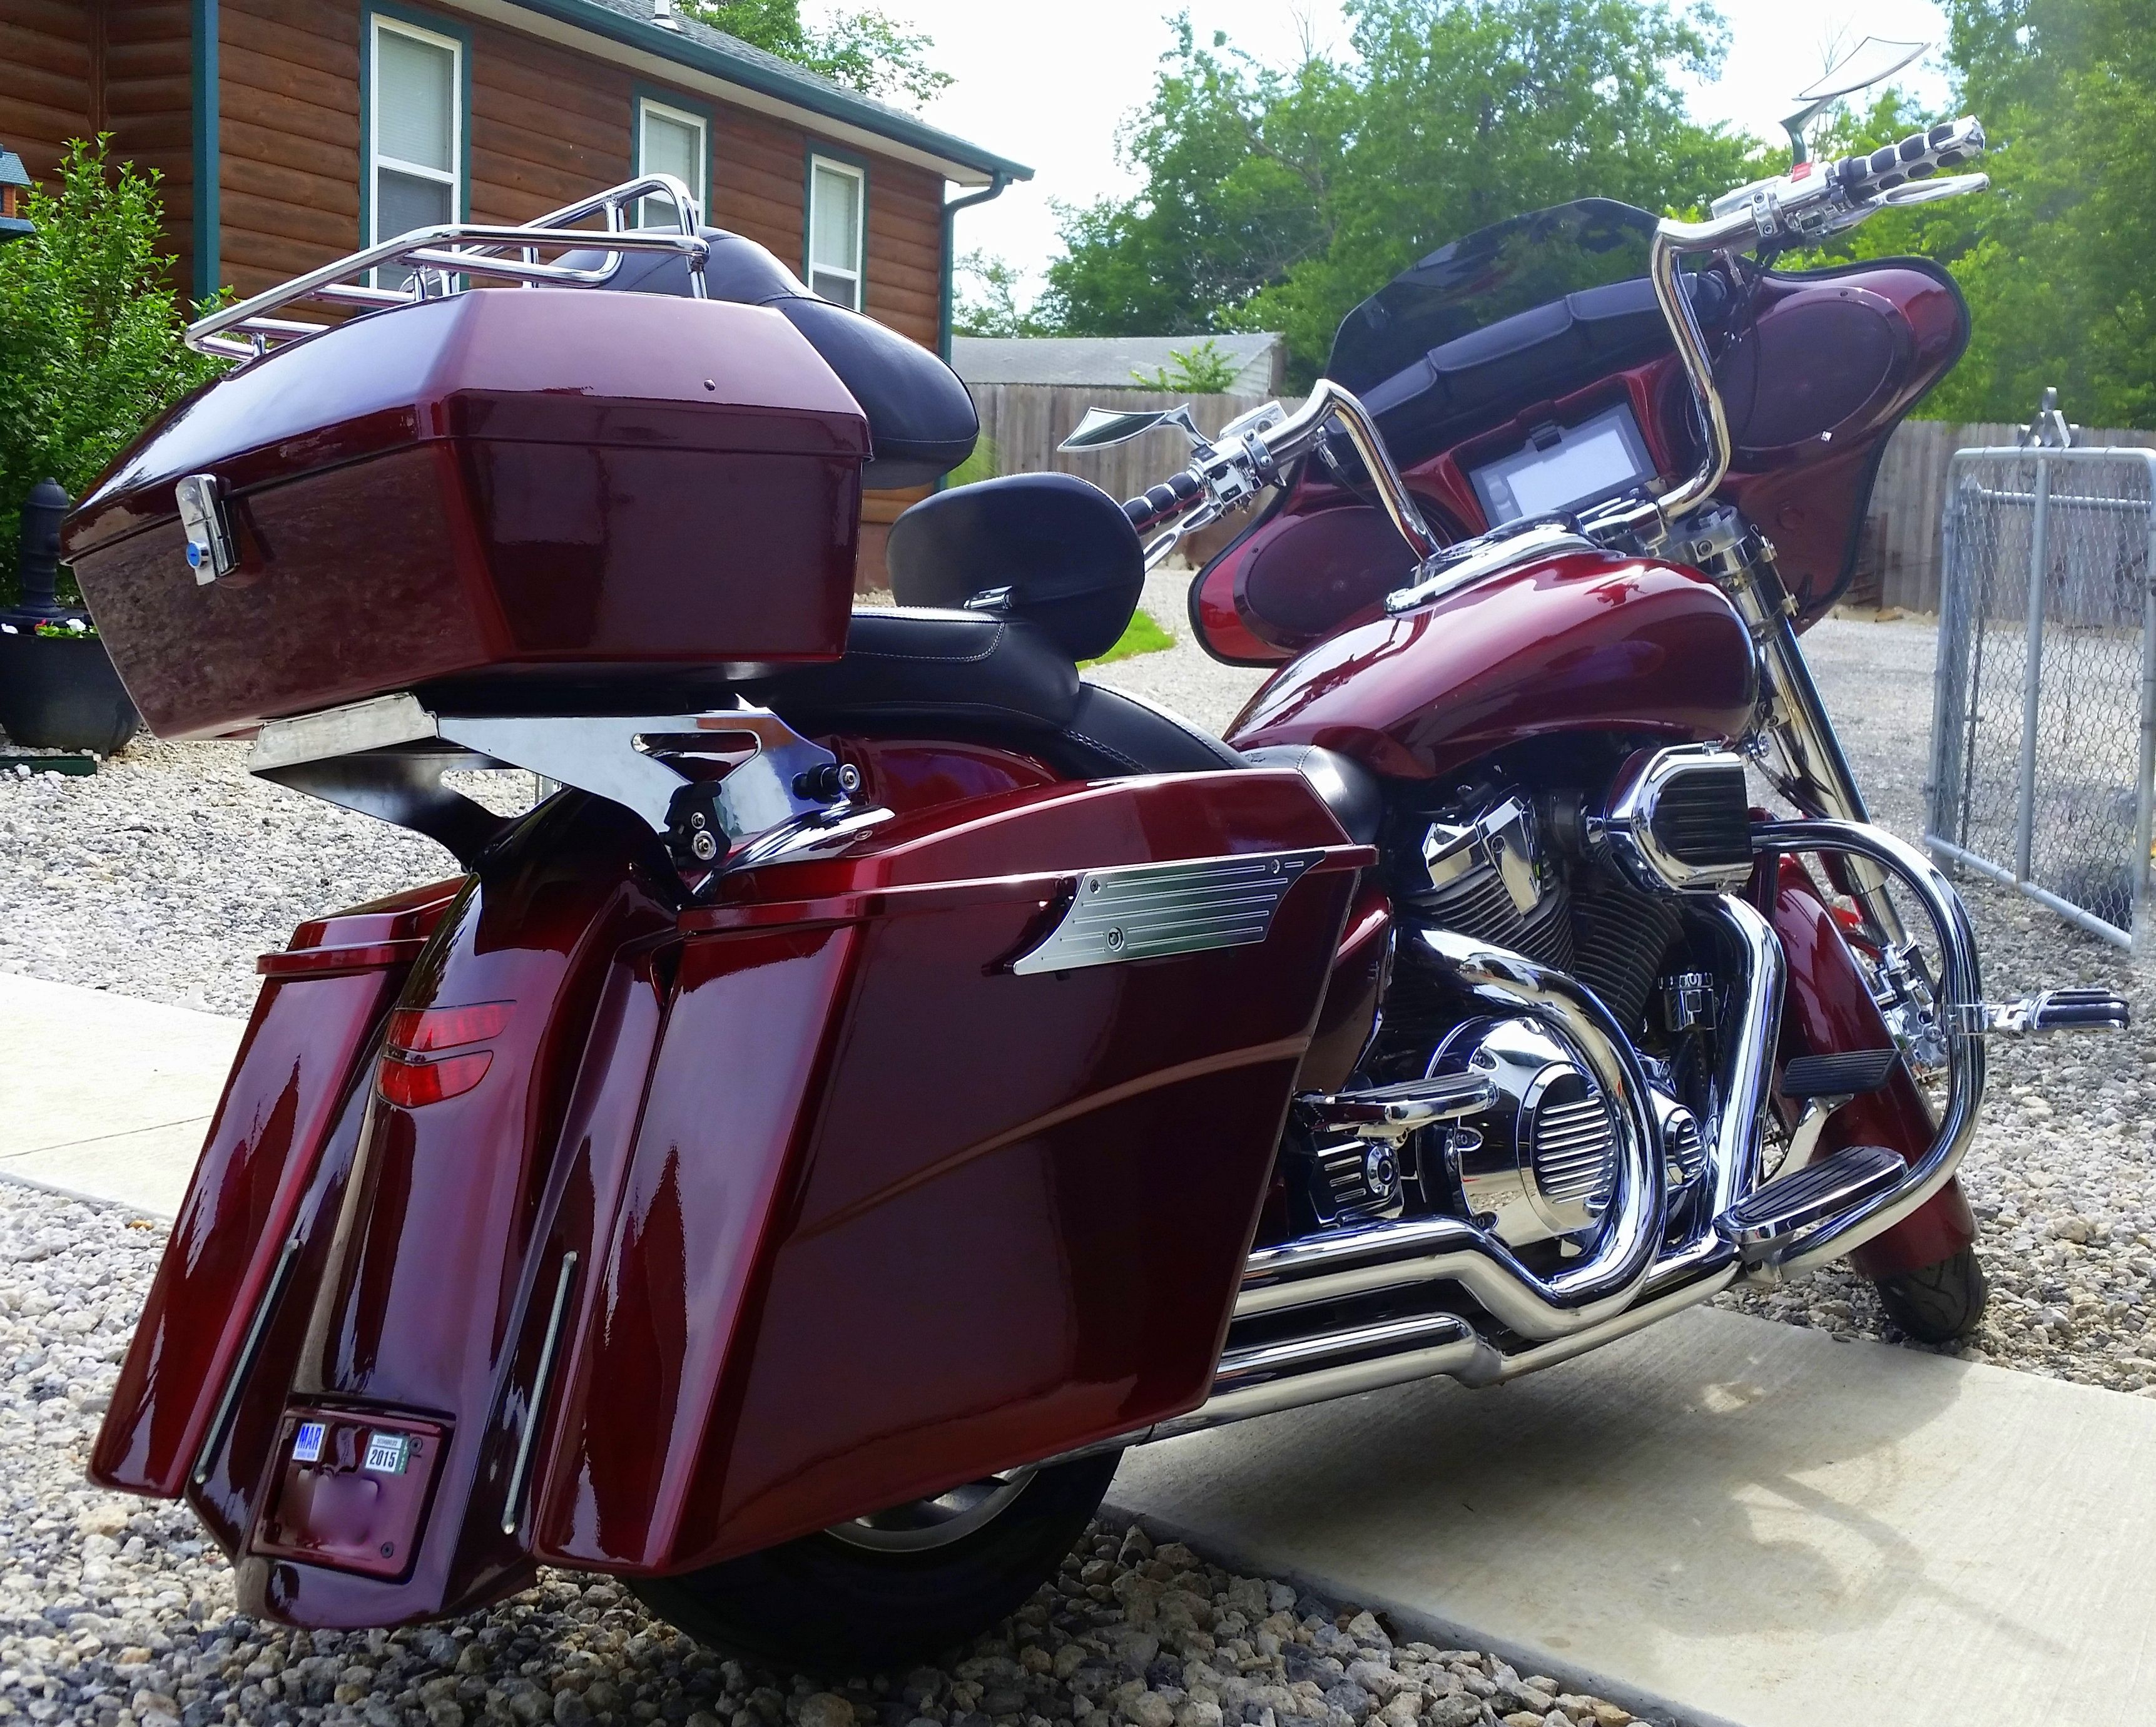 hight resolution of honda 1800 vtx 2004 custom baggers harley davidson cars motorcycles honda dream